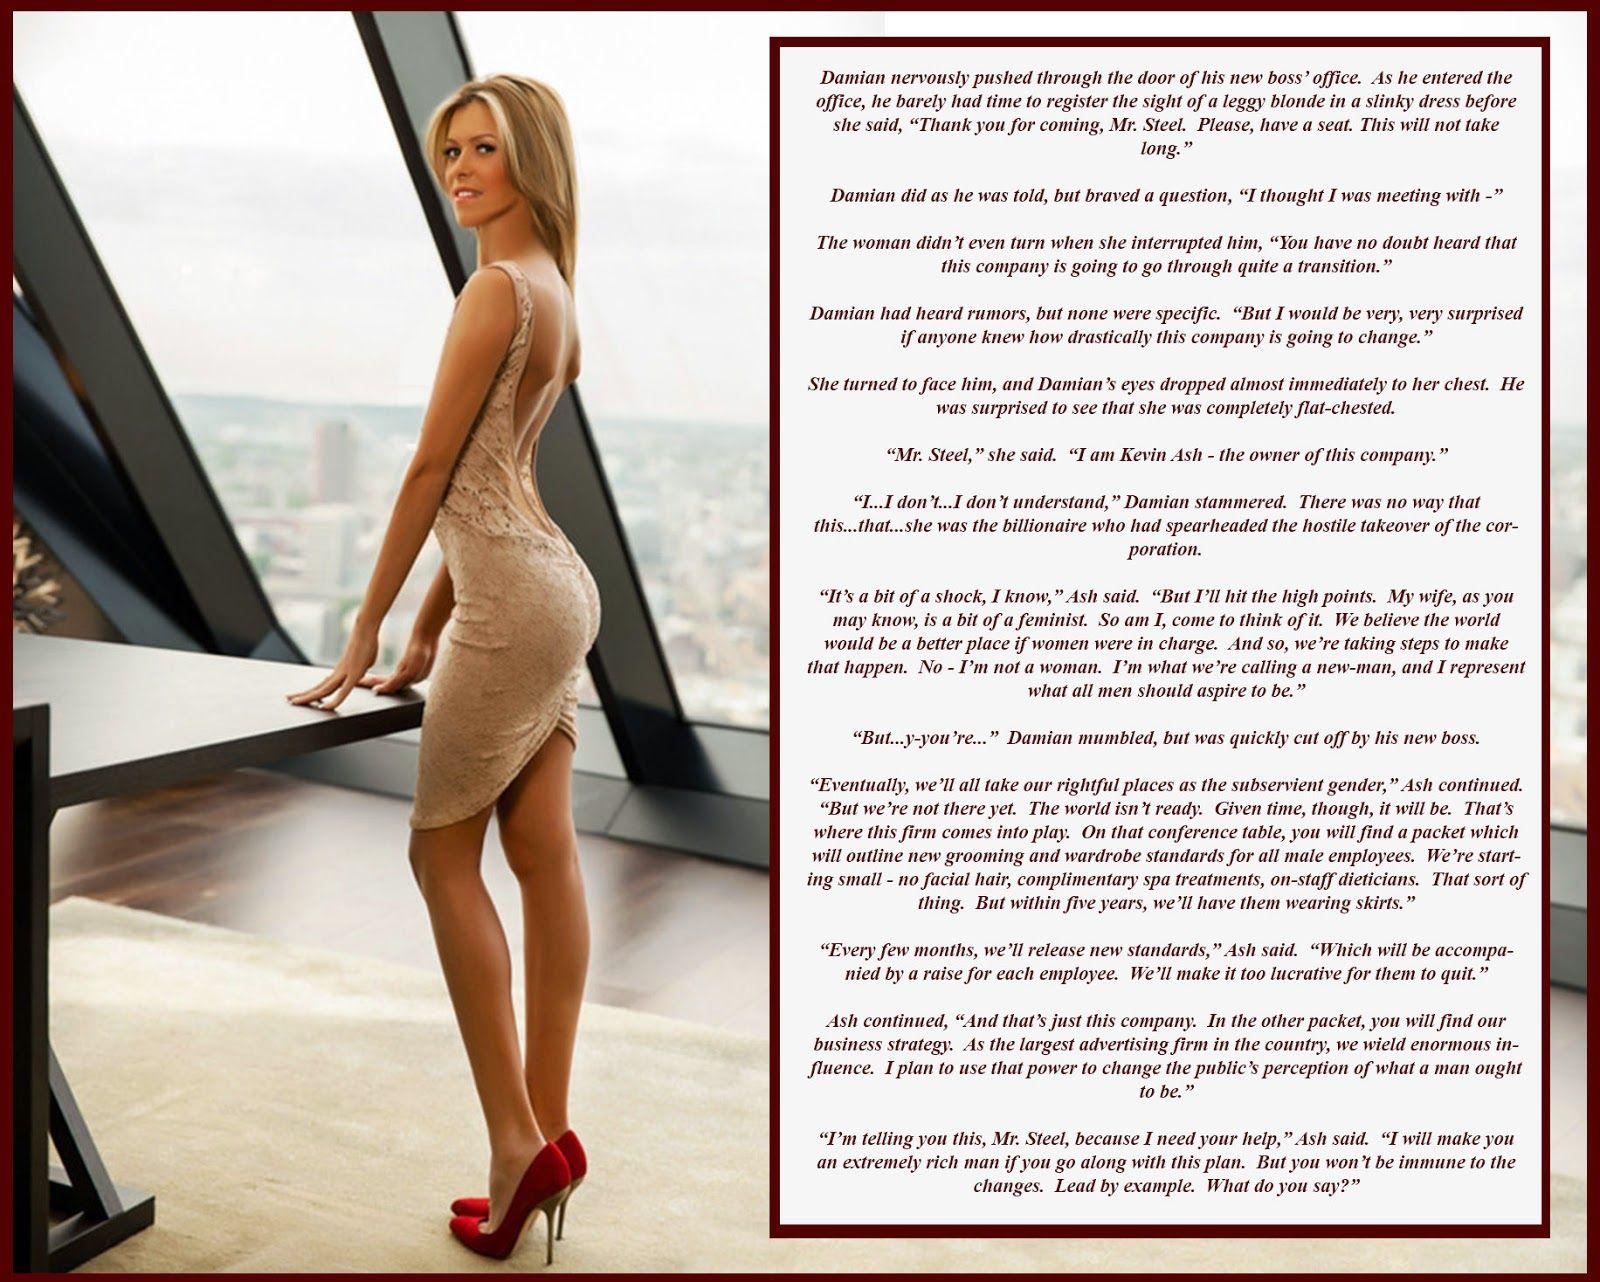 Role reversal boss woman sex